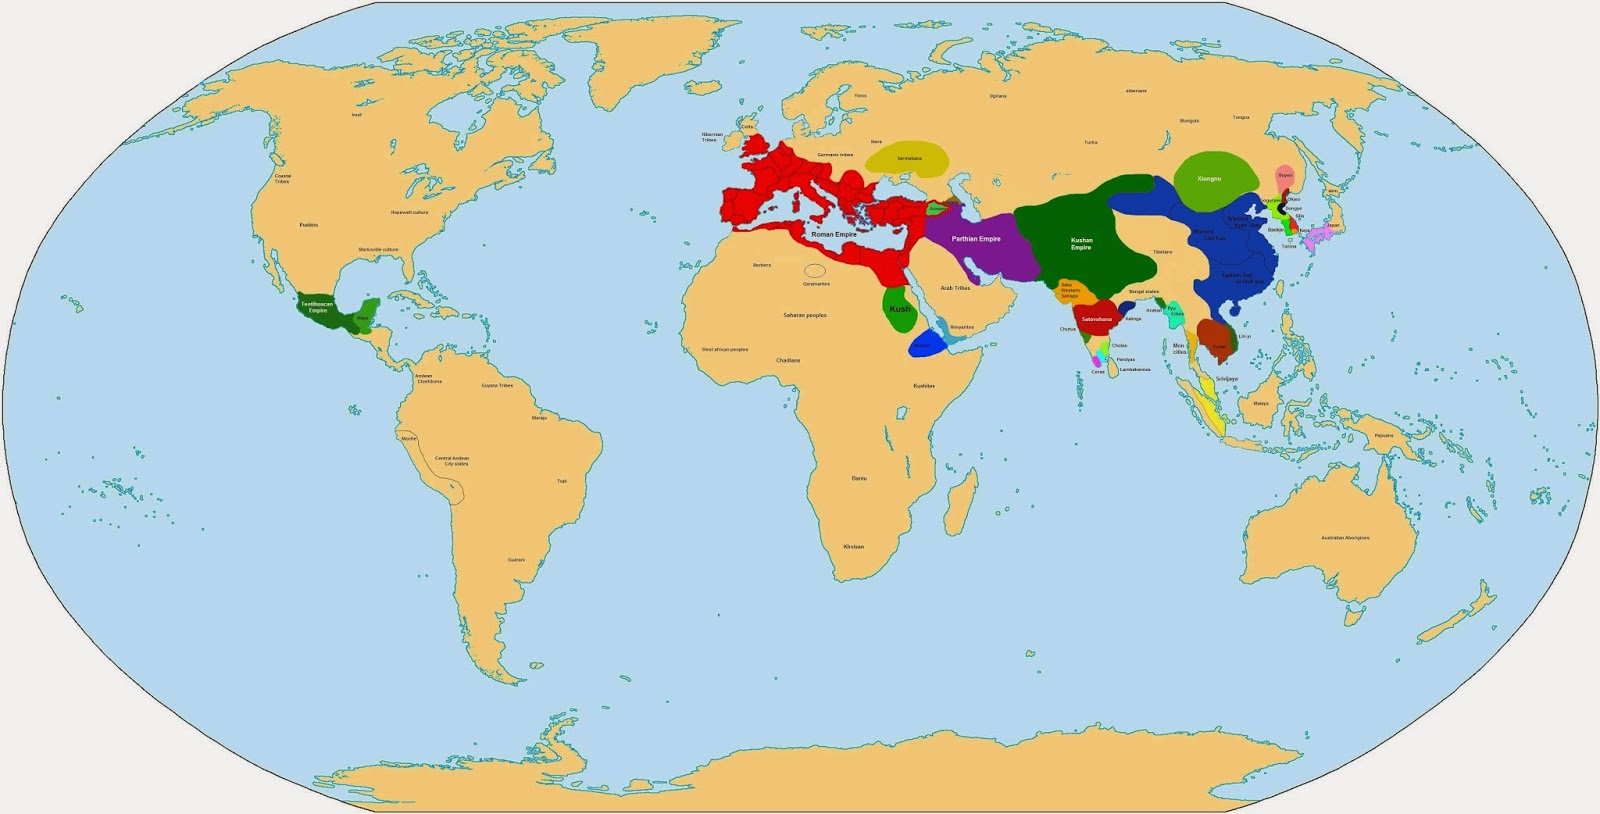 Pangea Progress Maps That Explain The World